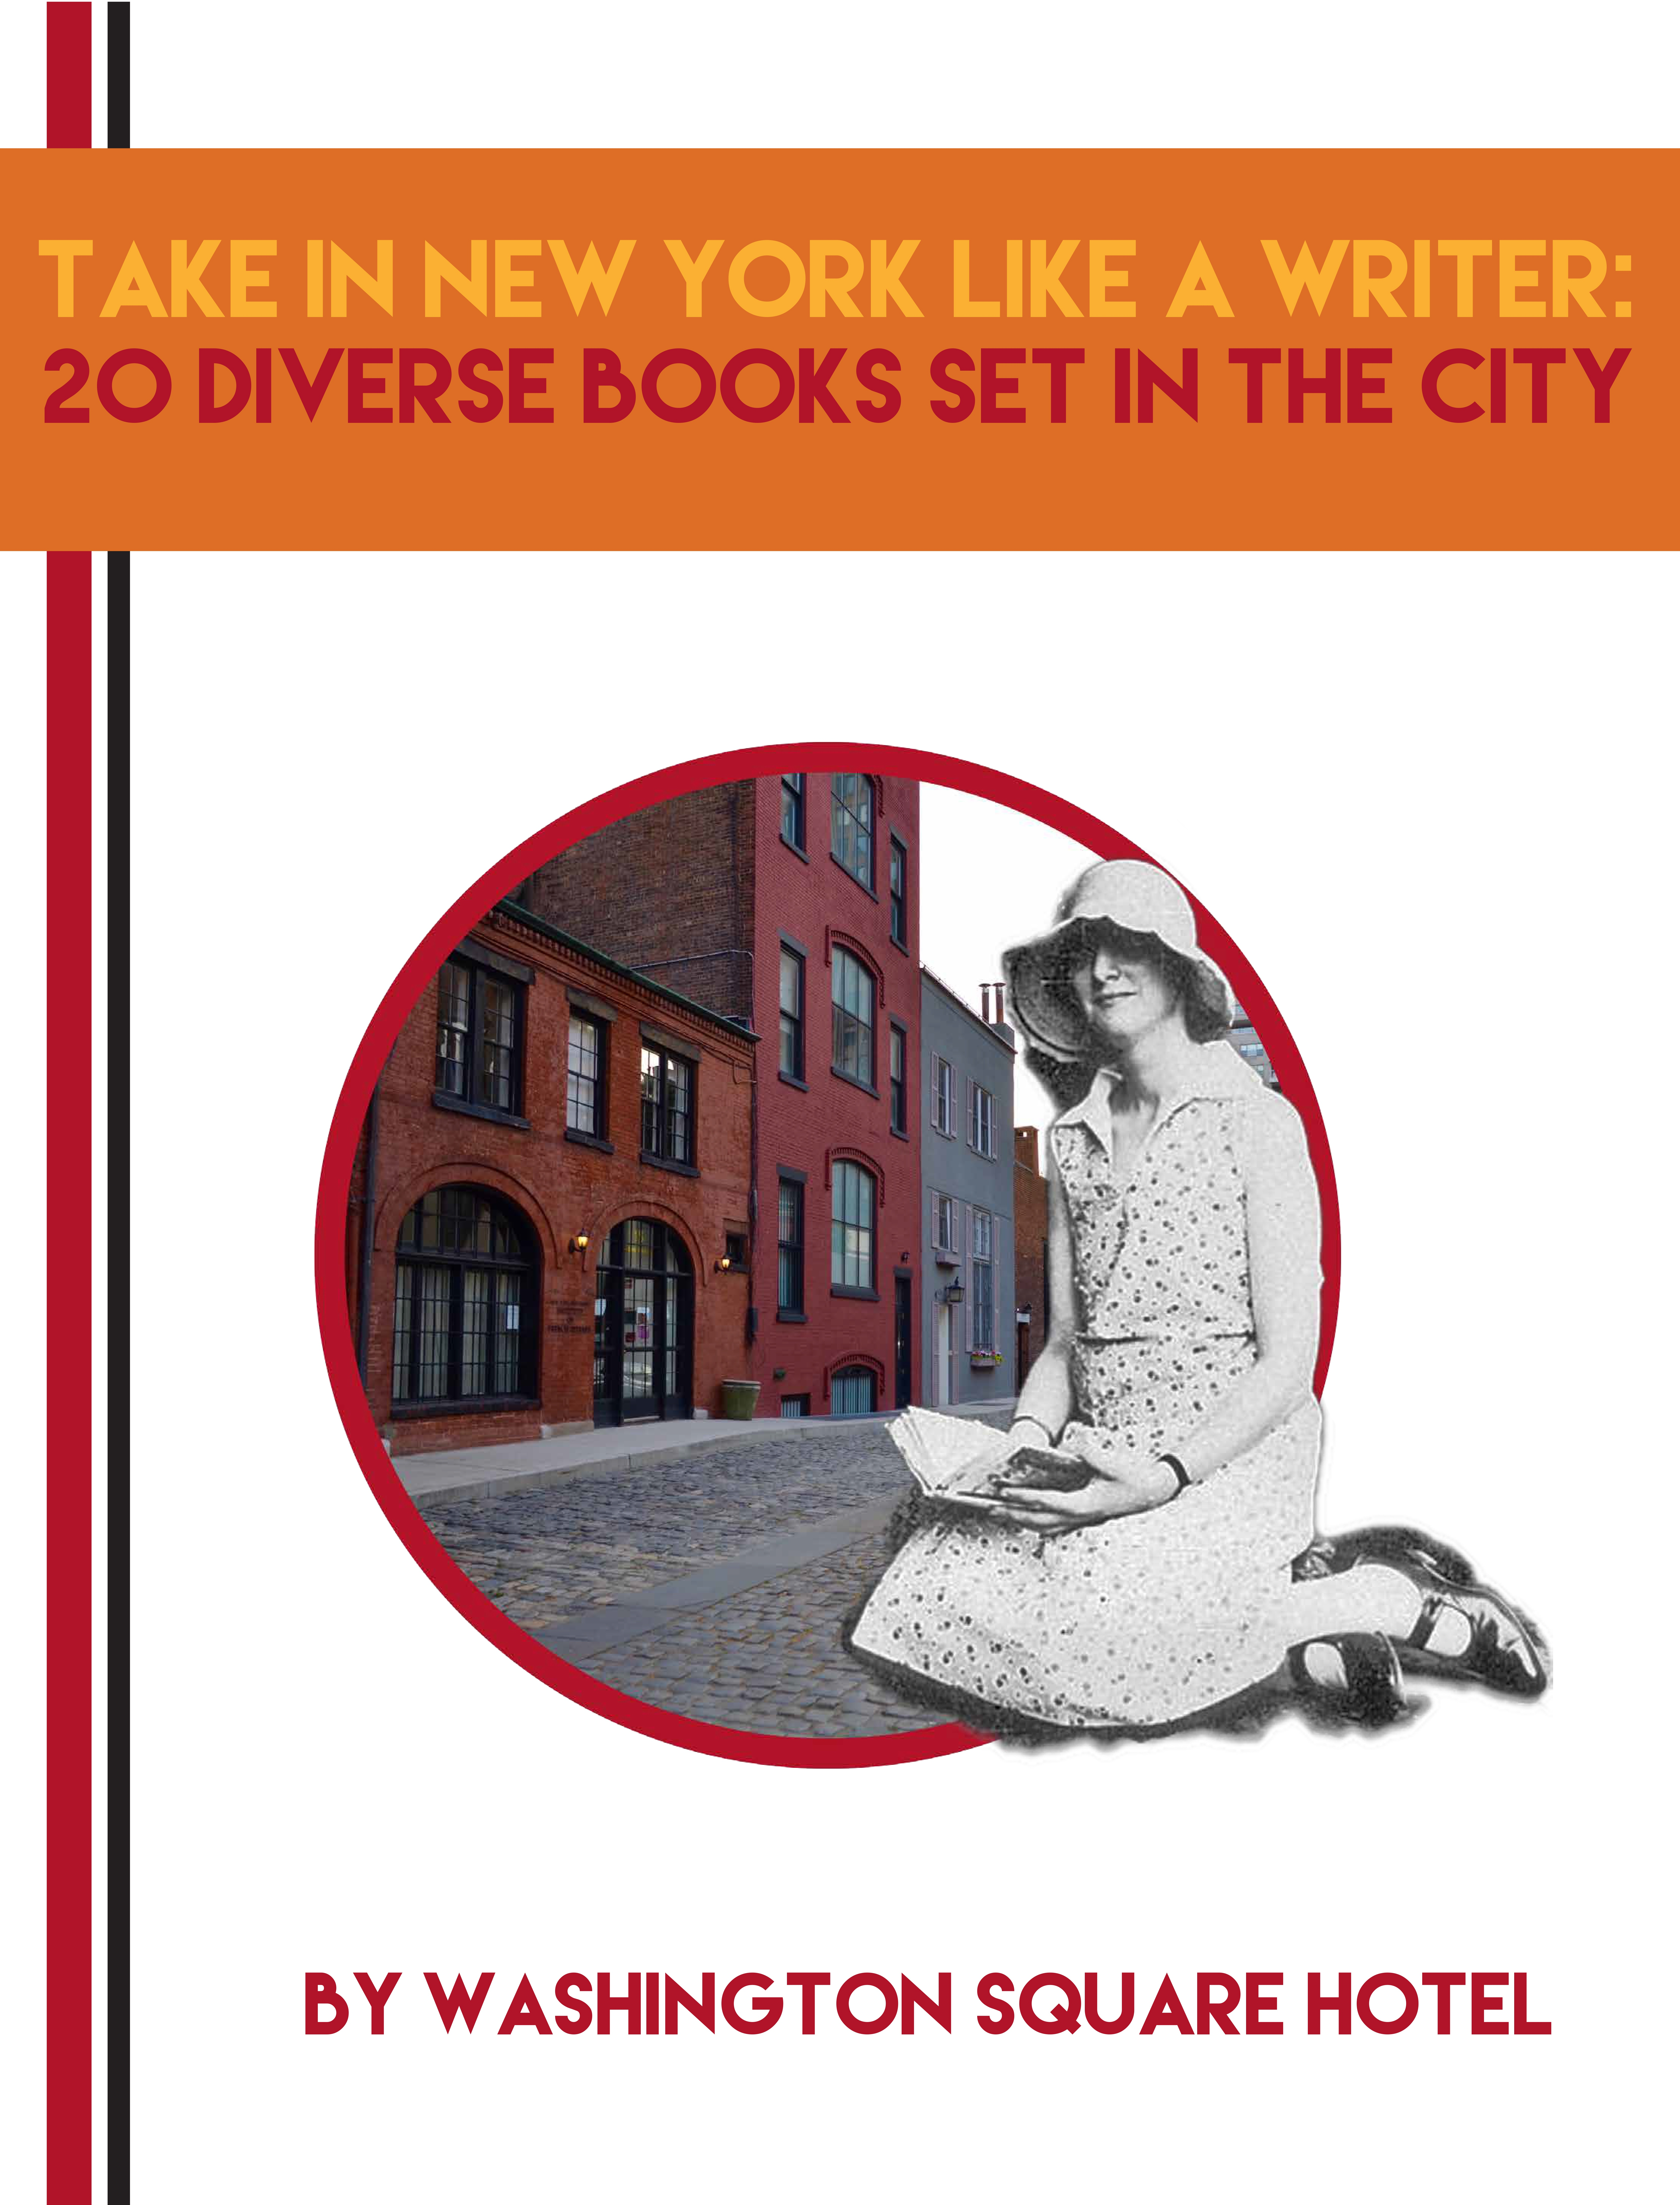 Books-NYC-Cover.jpg